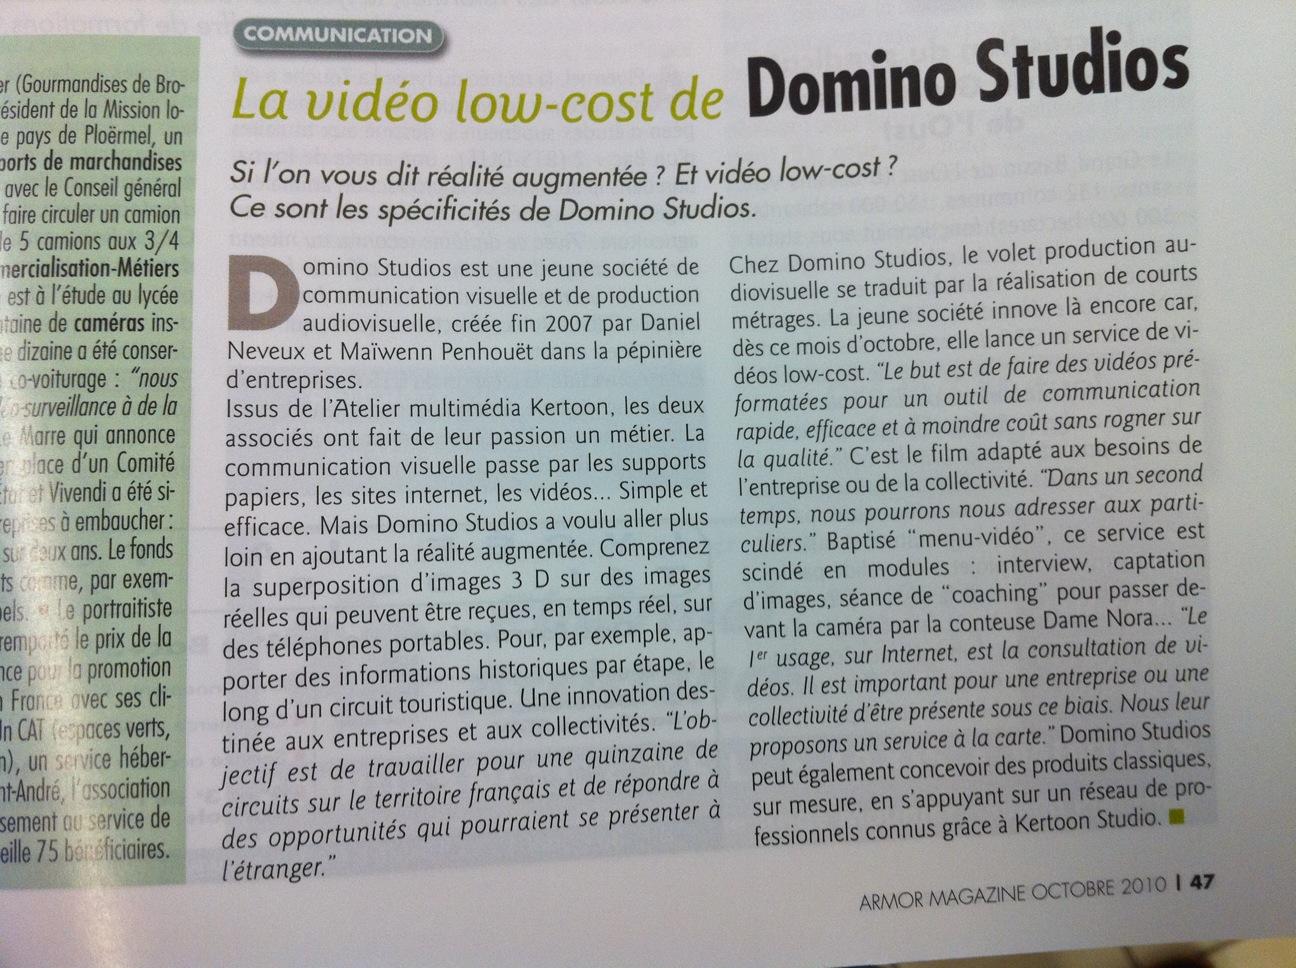 Domino Studios dans Armor Magazine